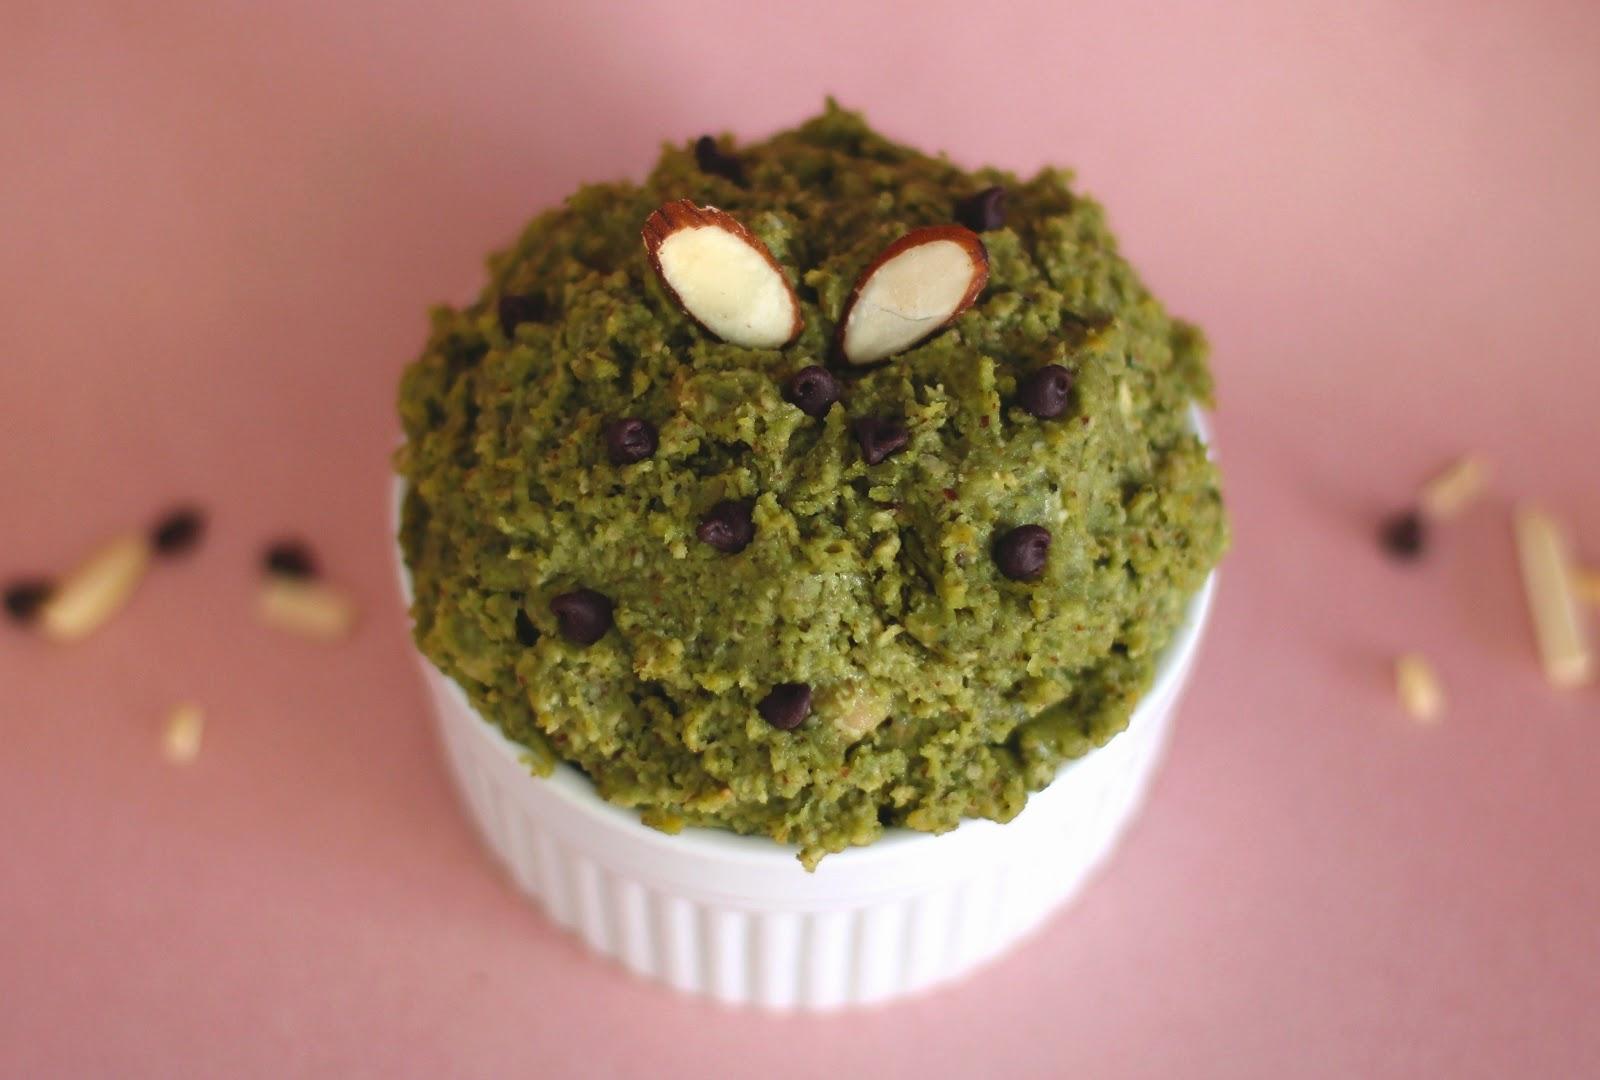 ... With Benefits Healthy Matcha Green Tea Shortbread Cookie Dough